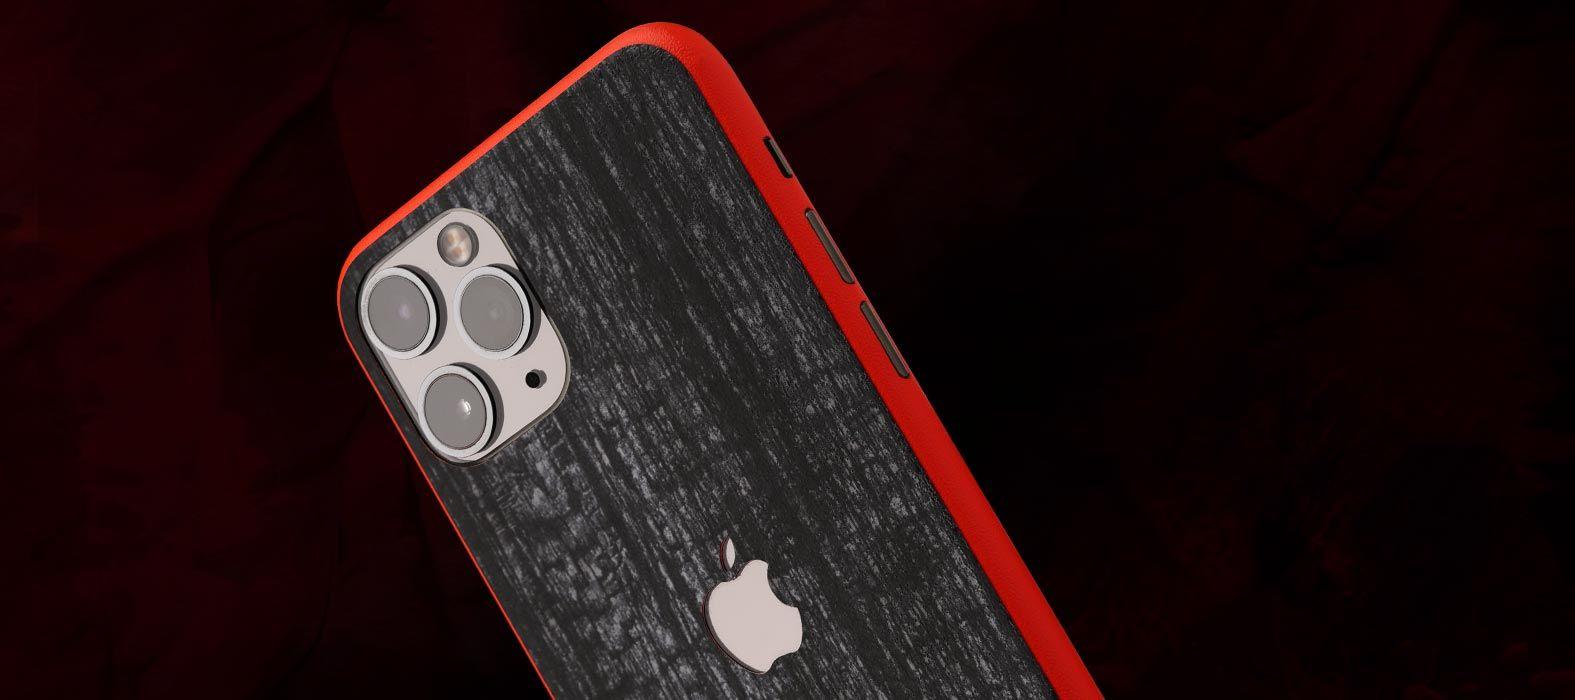 iPhone 11 Pro Firebug Skins